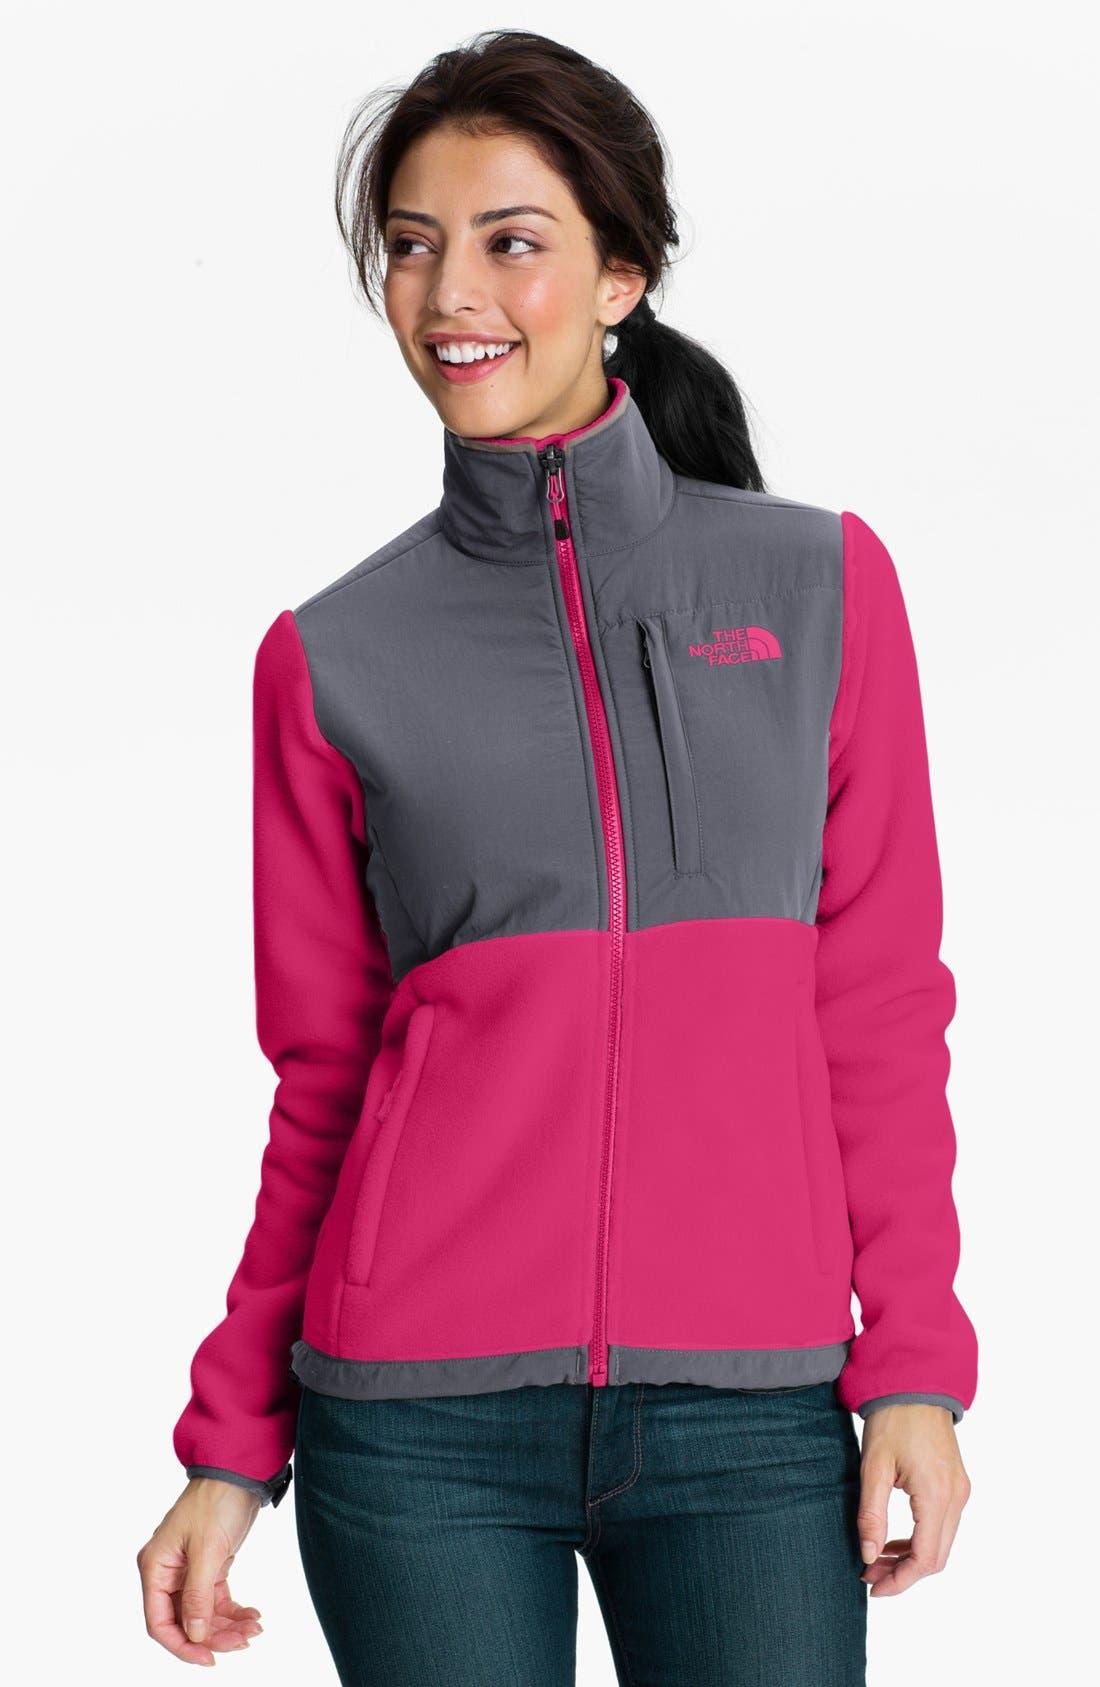 Alternate Image 1 Selected - The North Face 'Denali' Jacket ($179 Value)